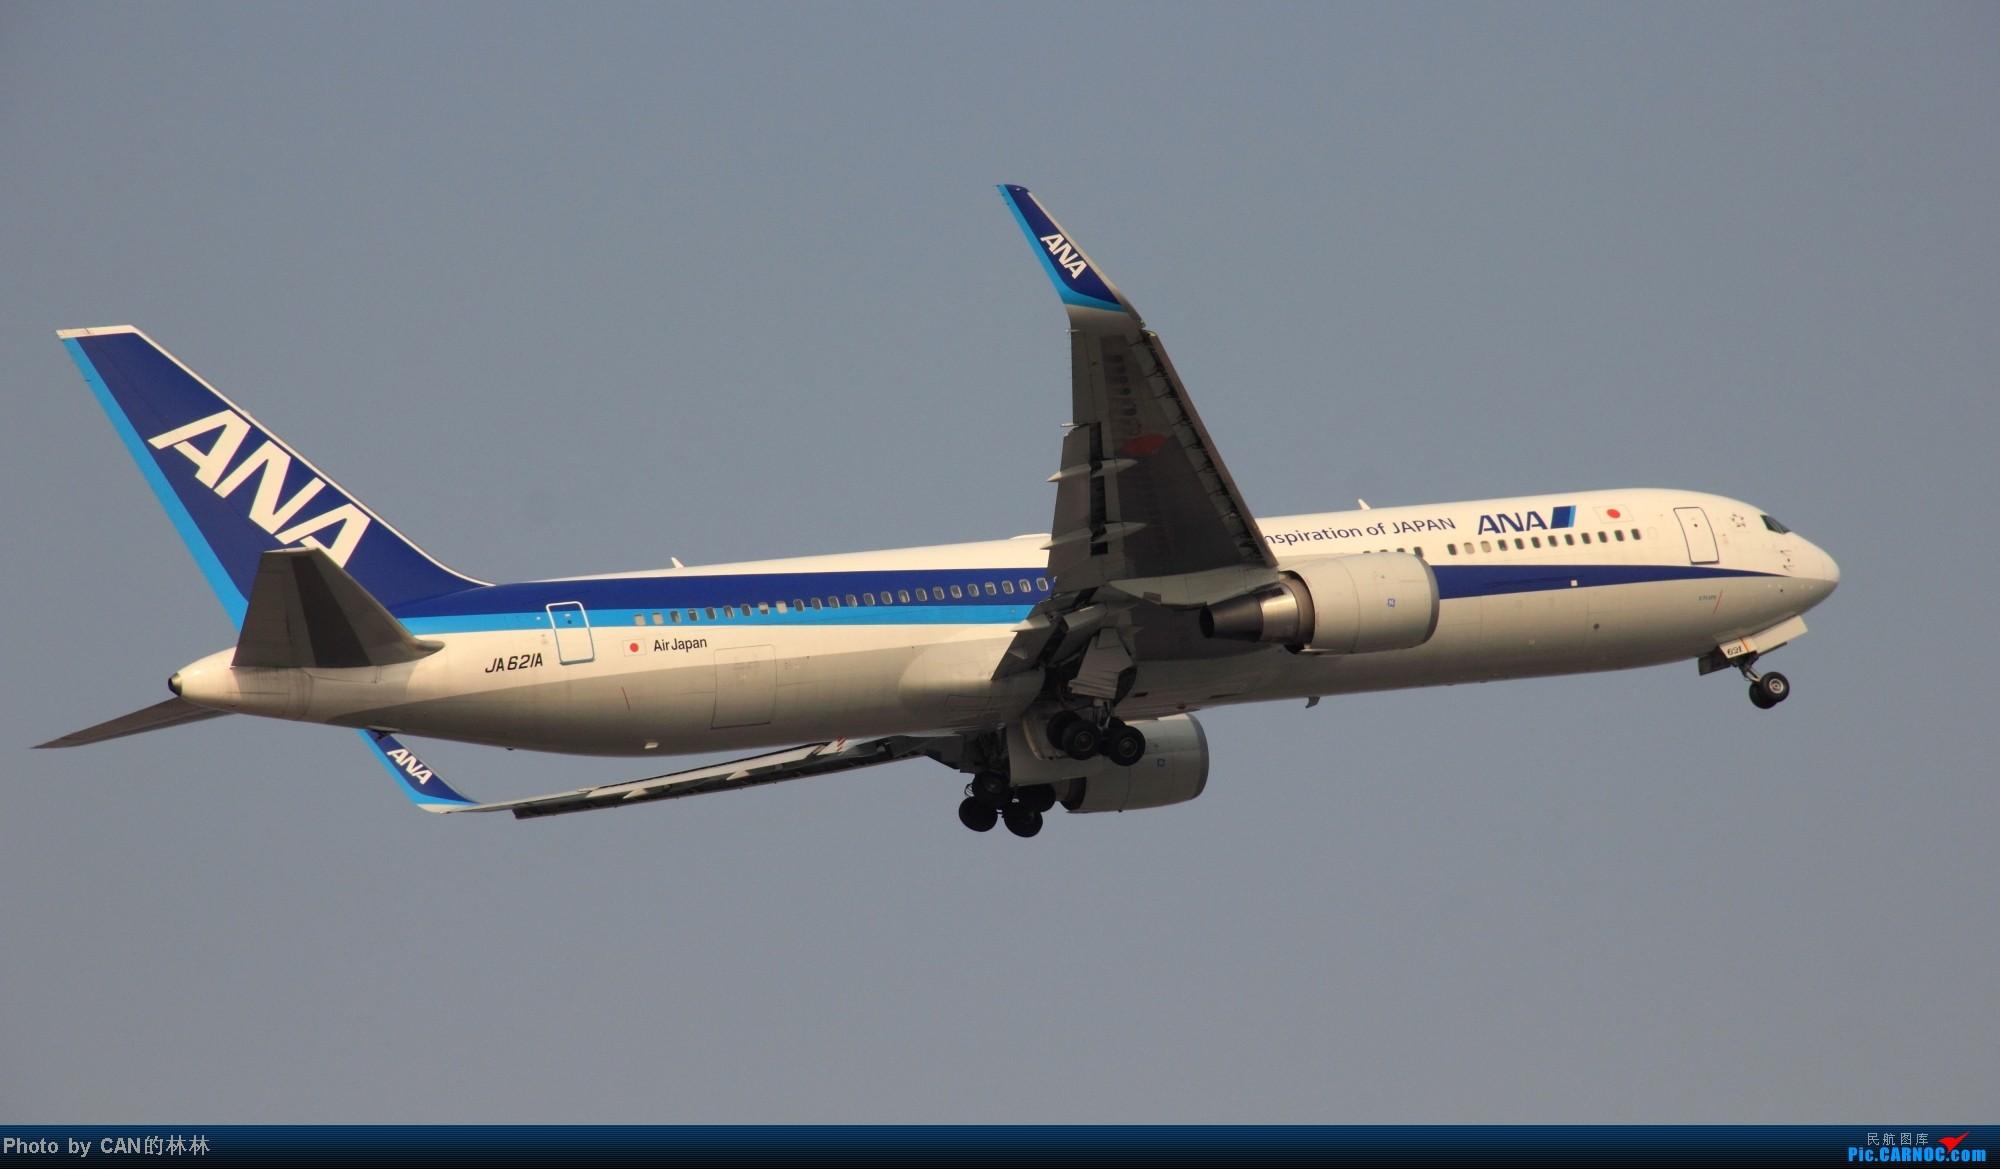 Re:[原创]首发贴,CAN的东跑,早上好! BOEING 767-381/ER JA621A 中国广州白云机场